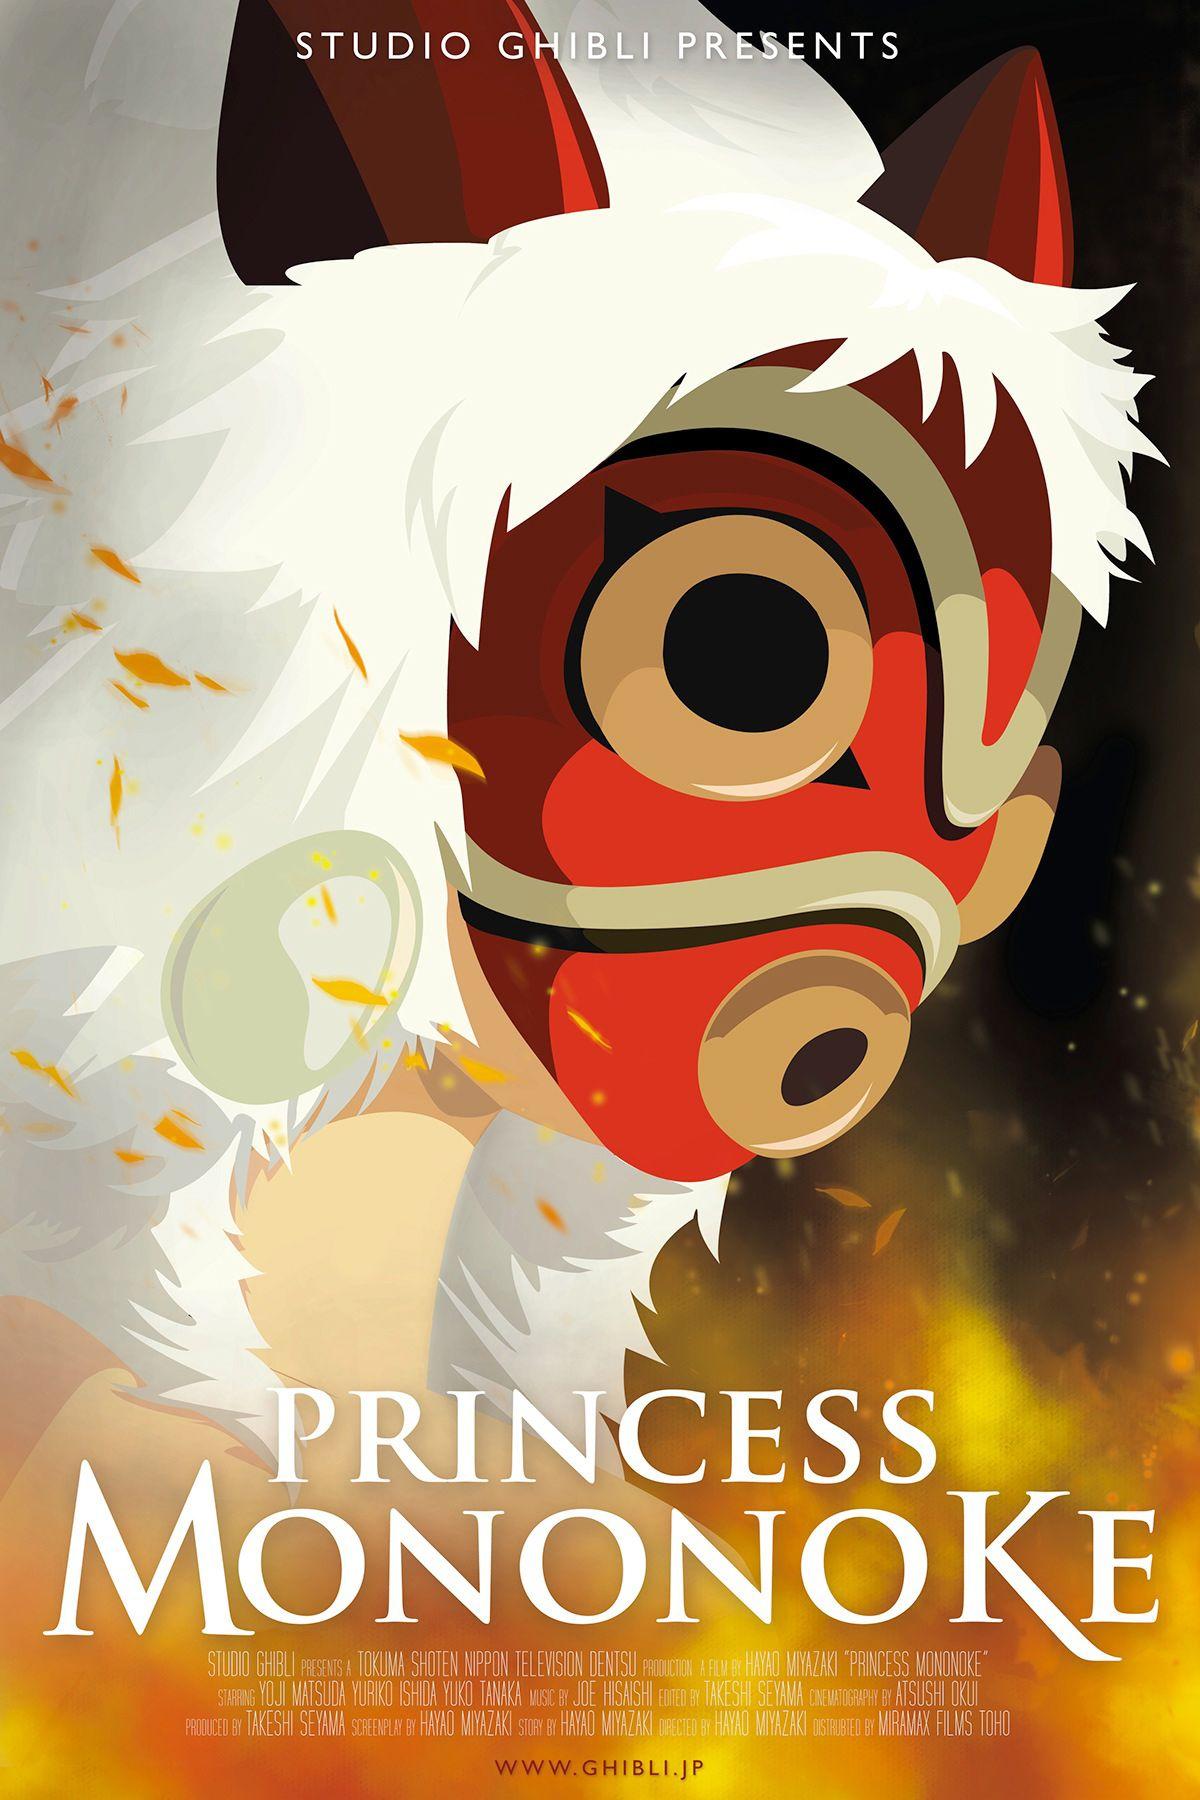 Hayao Miyazaki's Princess Mononoke movie poster